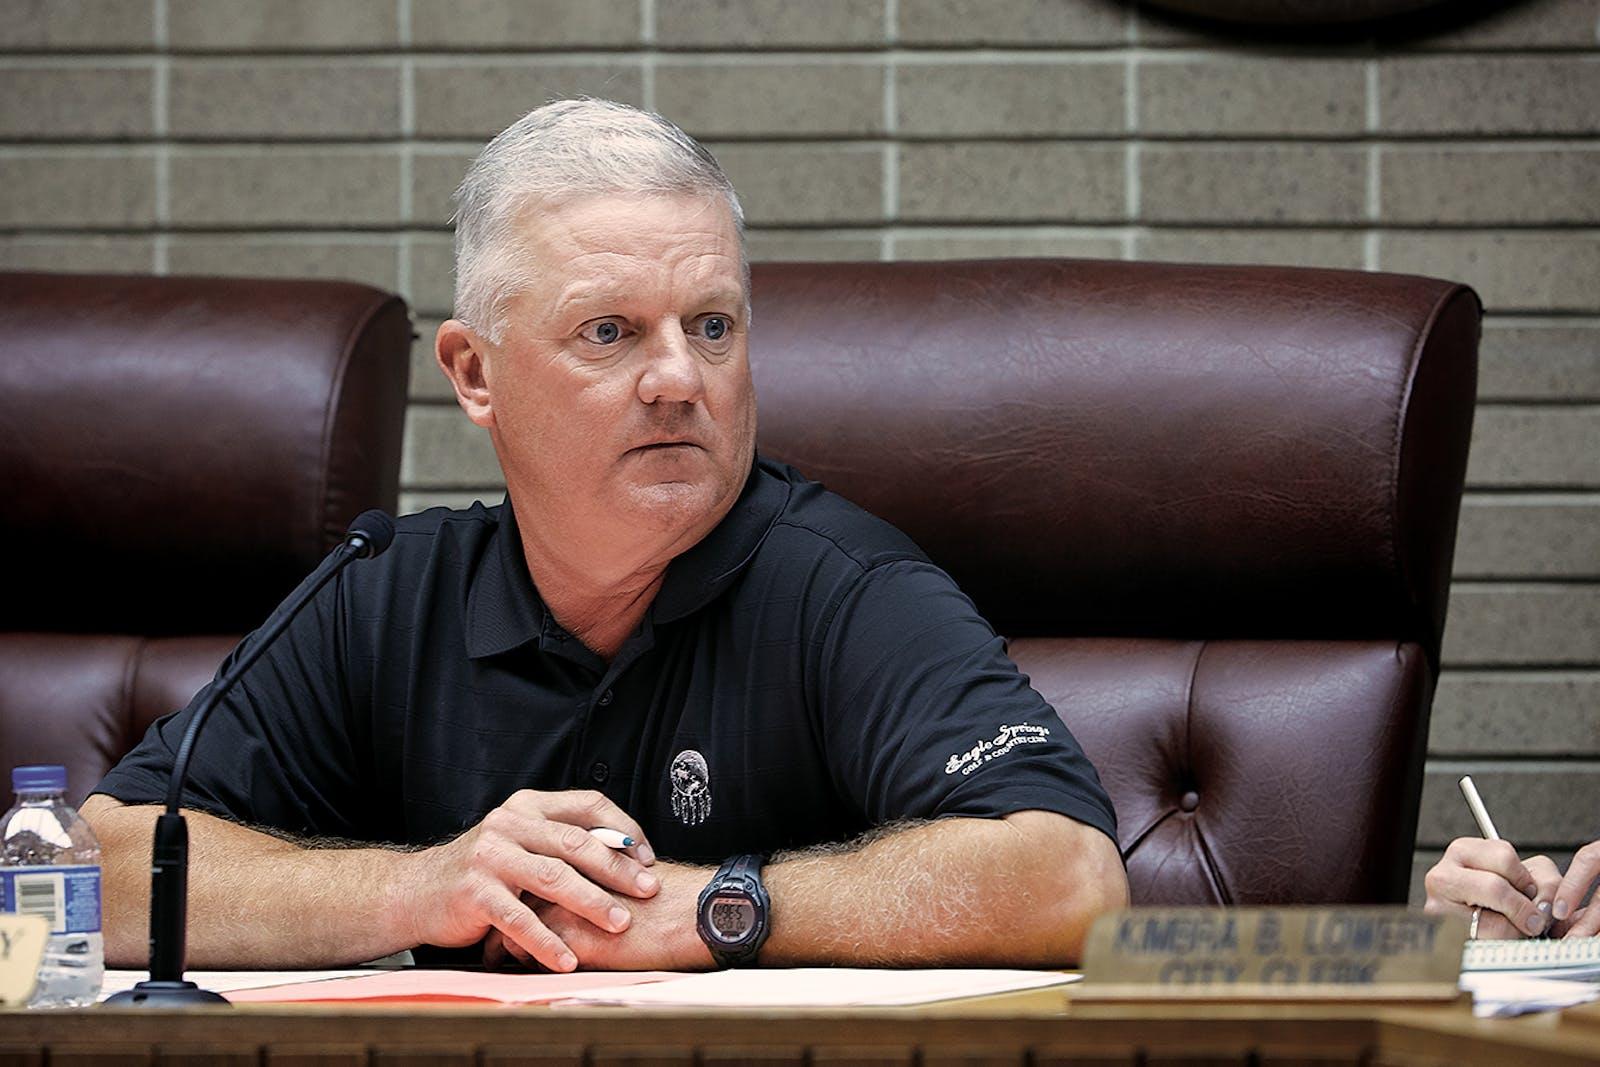 Groves mayor Brad P. Bailey